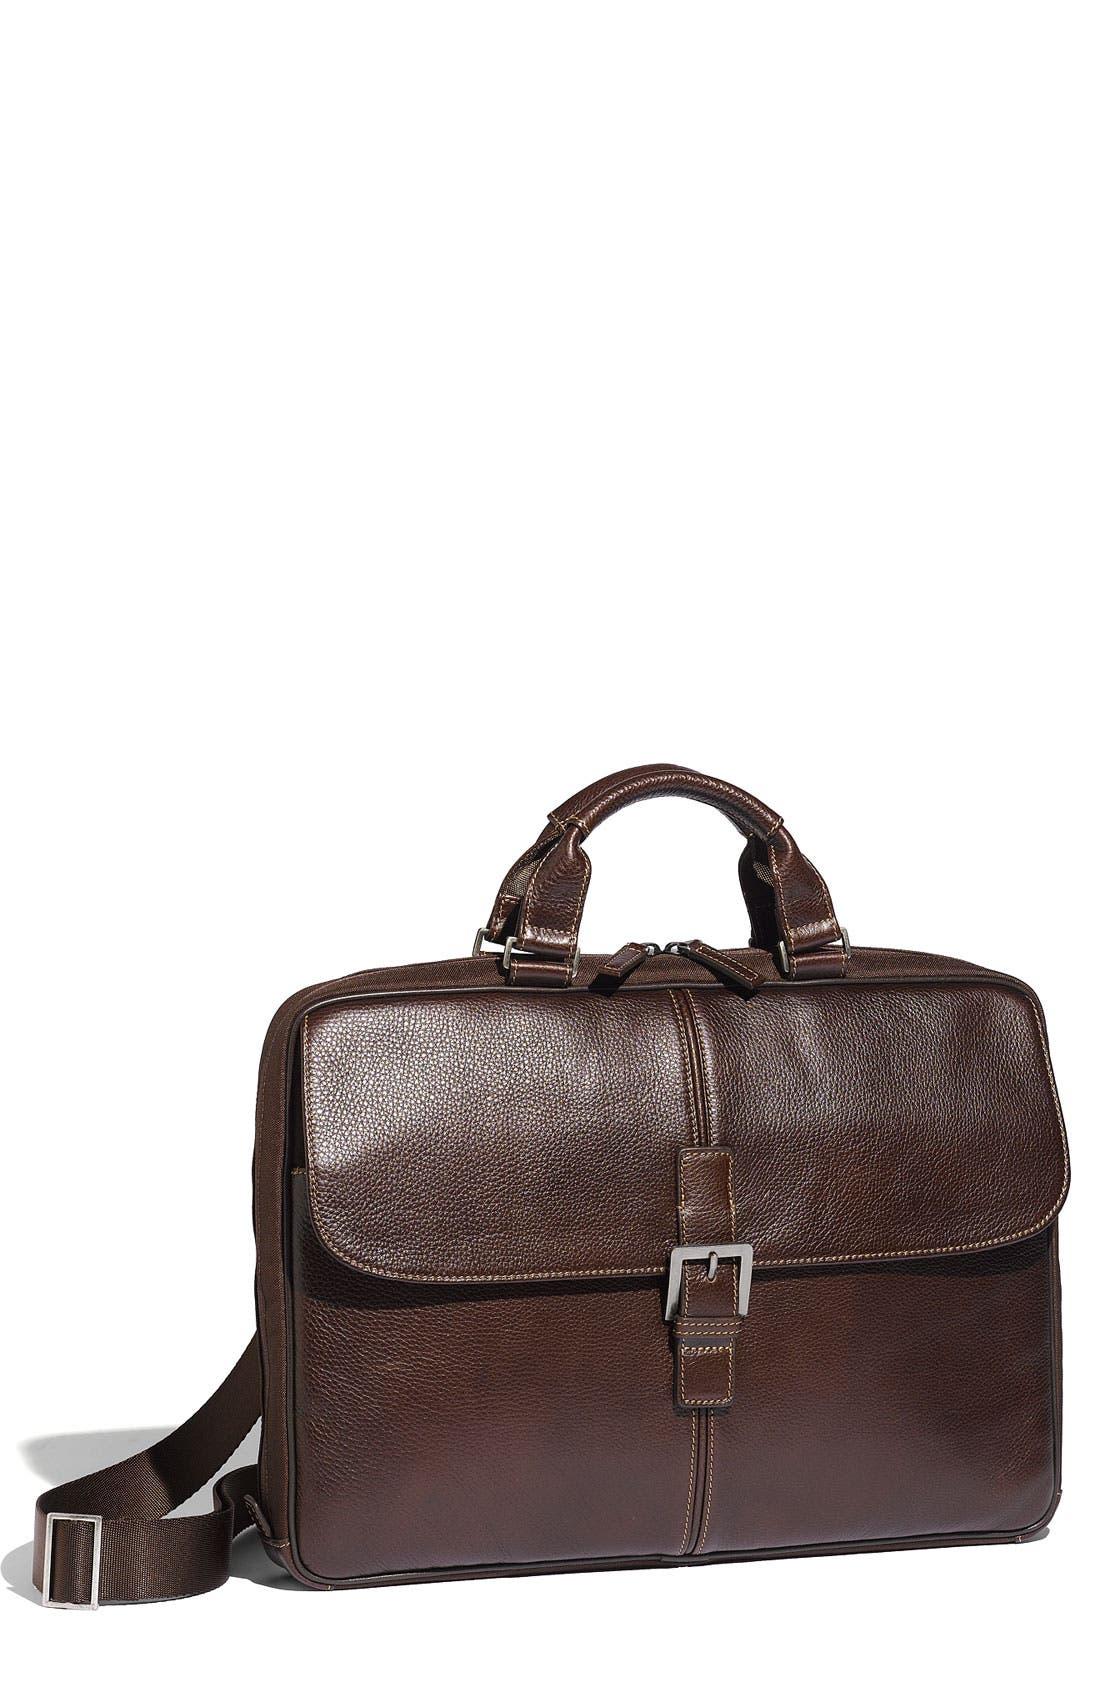 'Tyler' Tumbled Leather Portfolio Briefcase, Main, color, 205